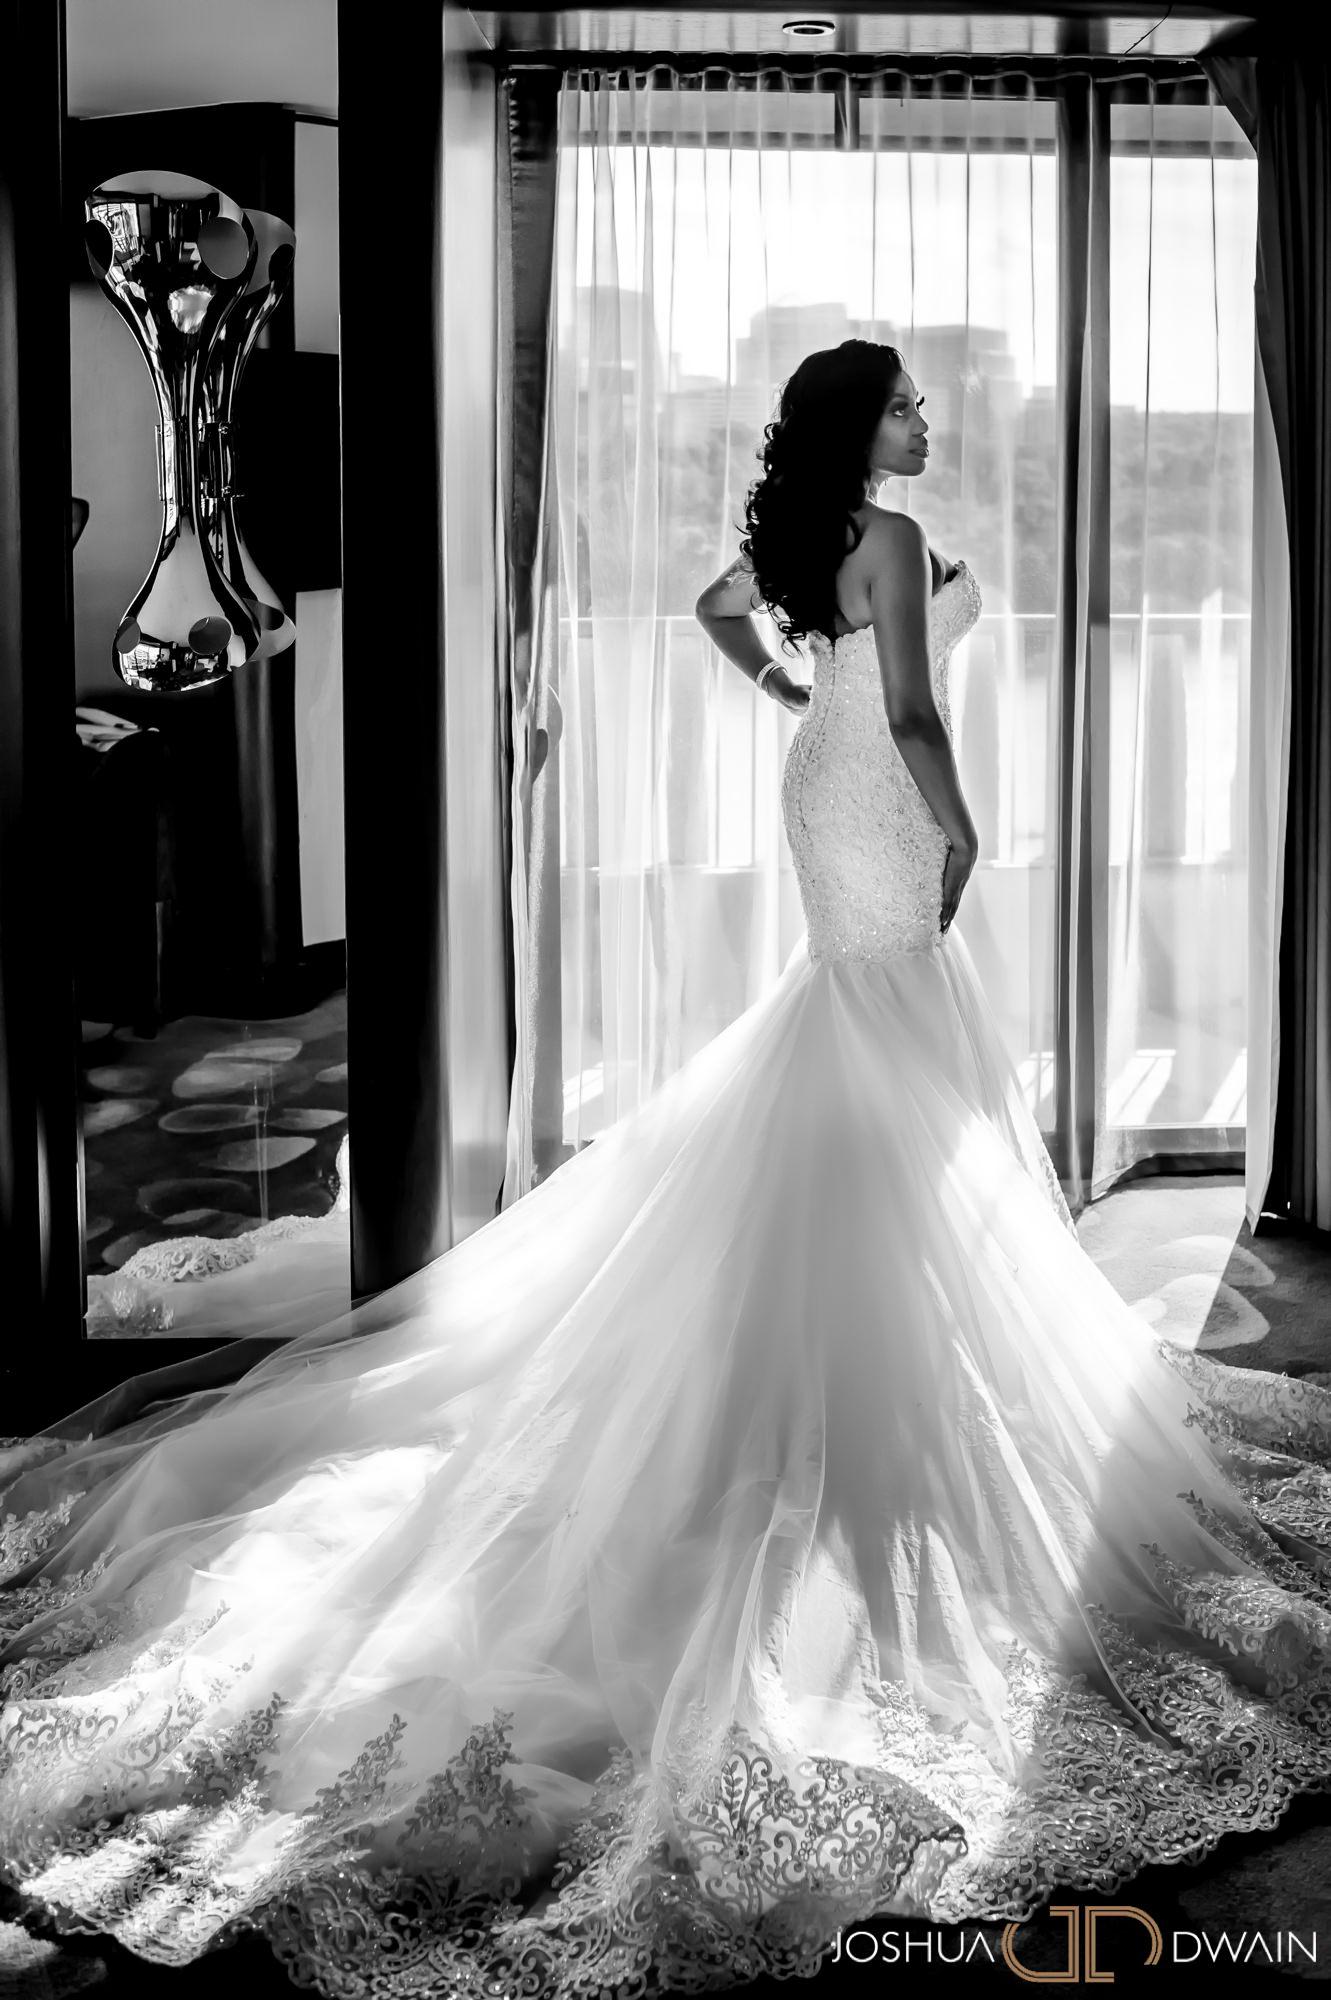 Shameka & Jeremy's Wedding at the Watergate Hotel in Washington, D.C.